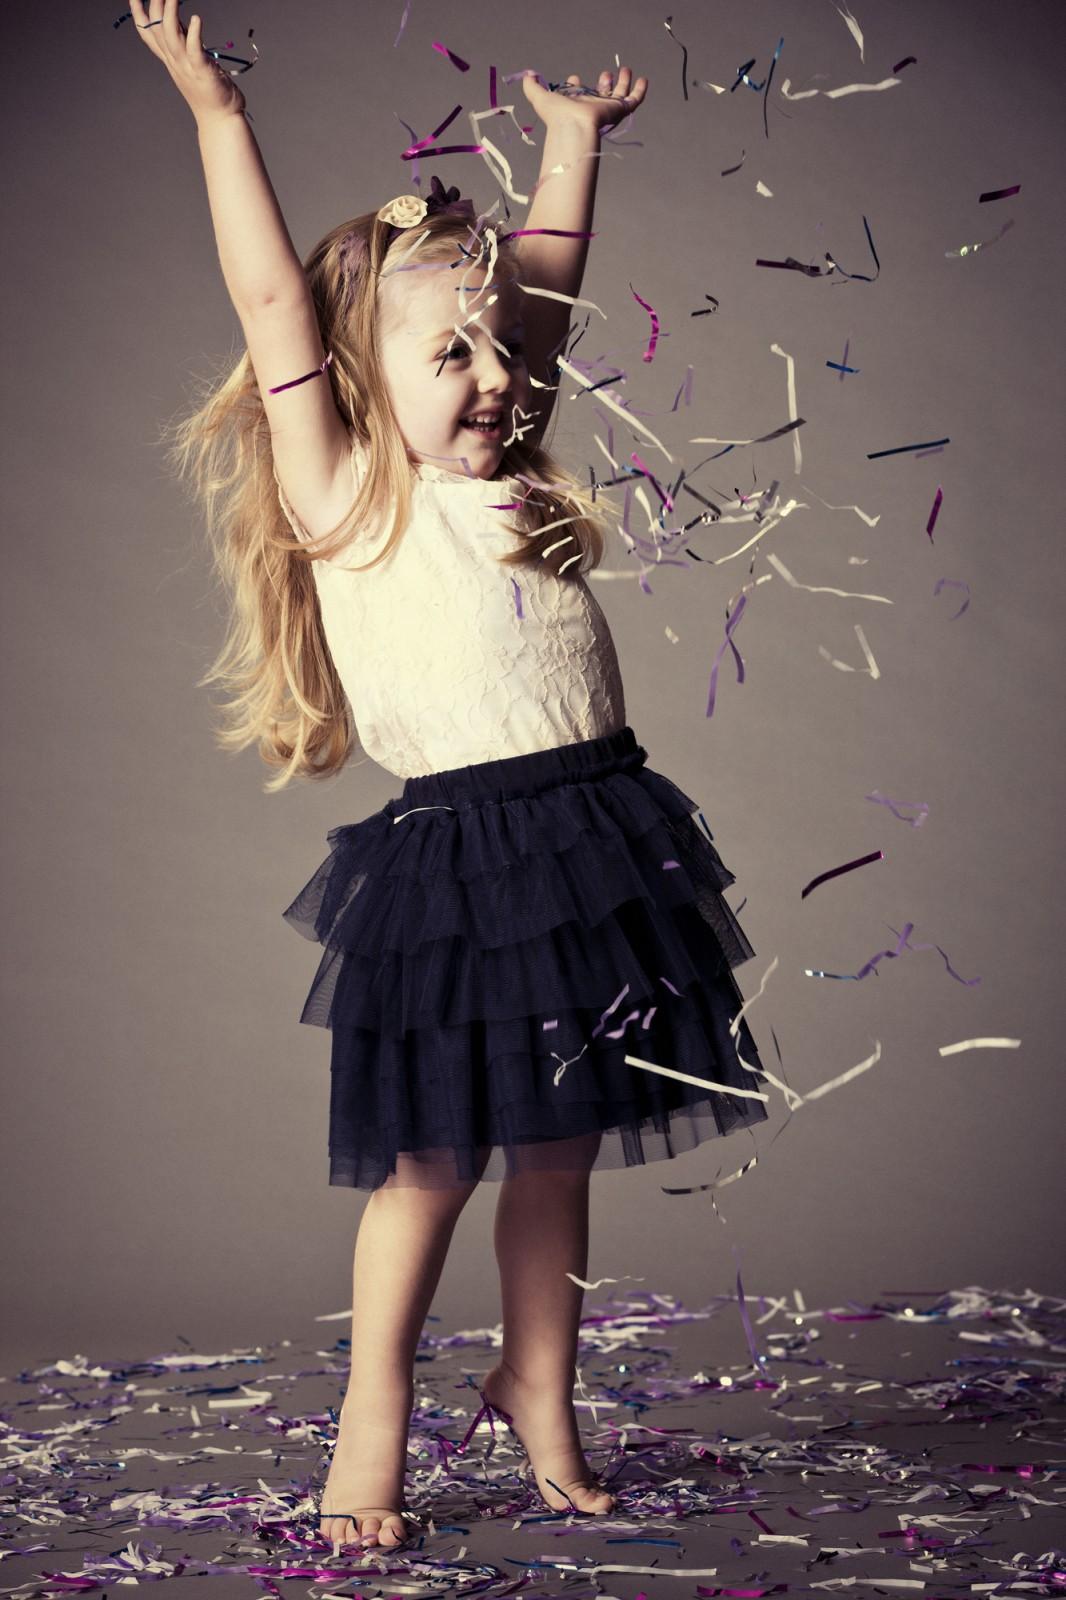 Michelle young kids fashion photographer lantern studio